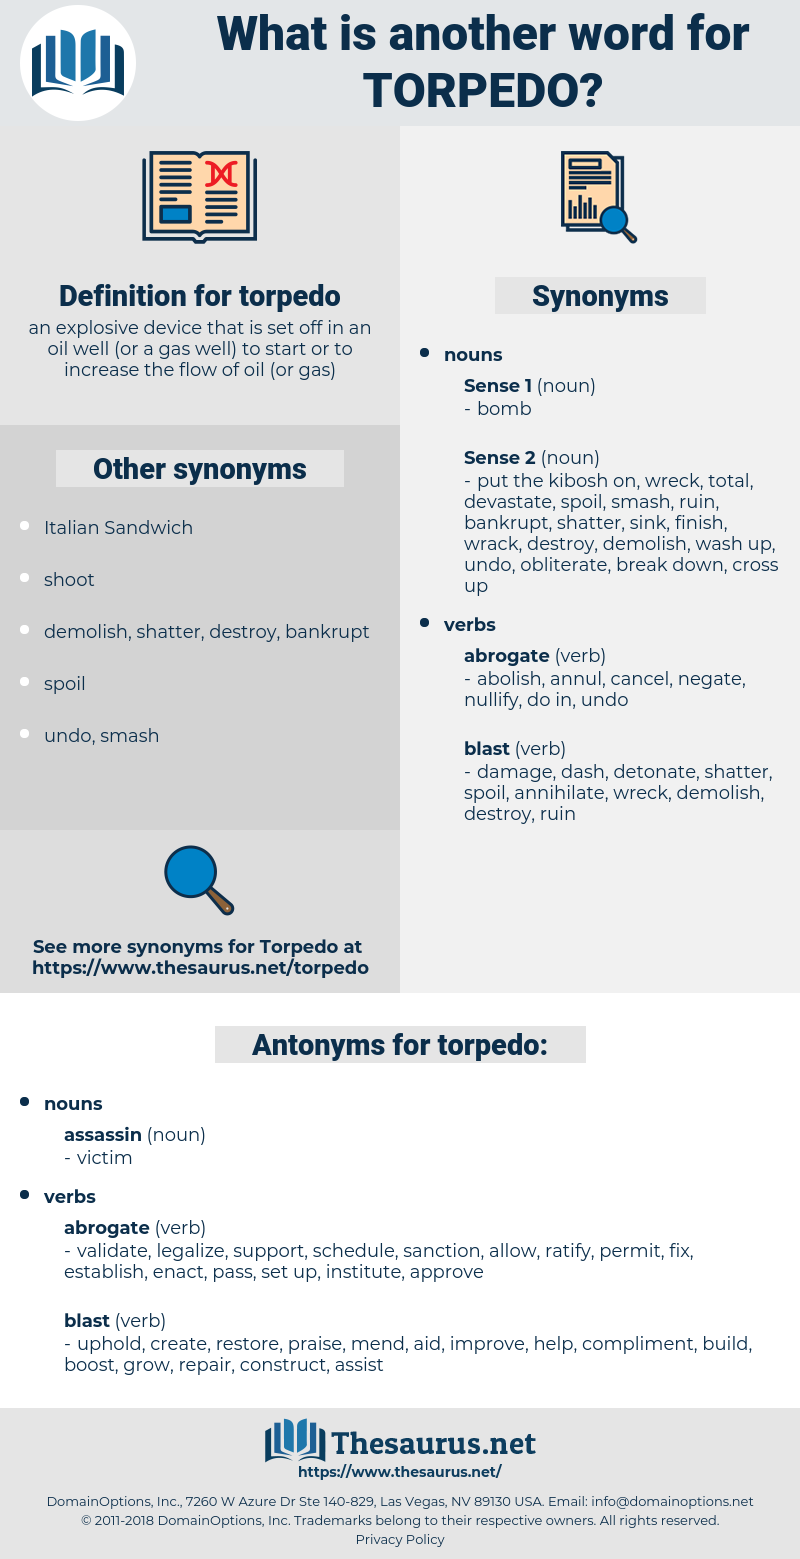 torpedo, synonym torpedo, another word for torpedo, words like torpedo, thesaurus torpedo